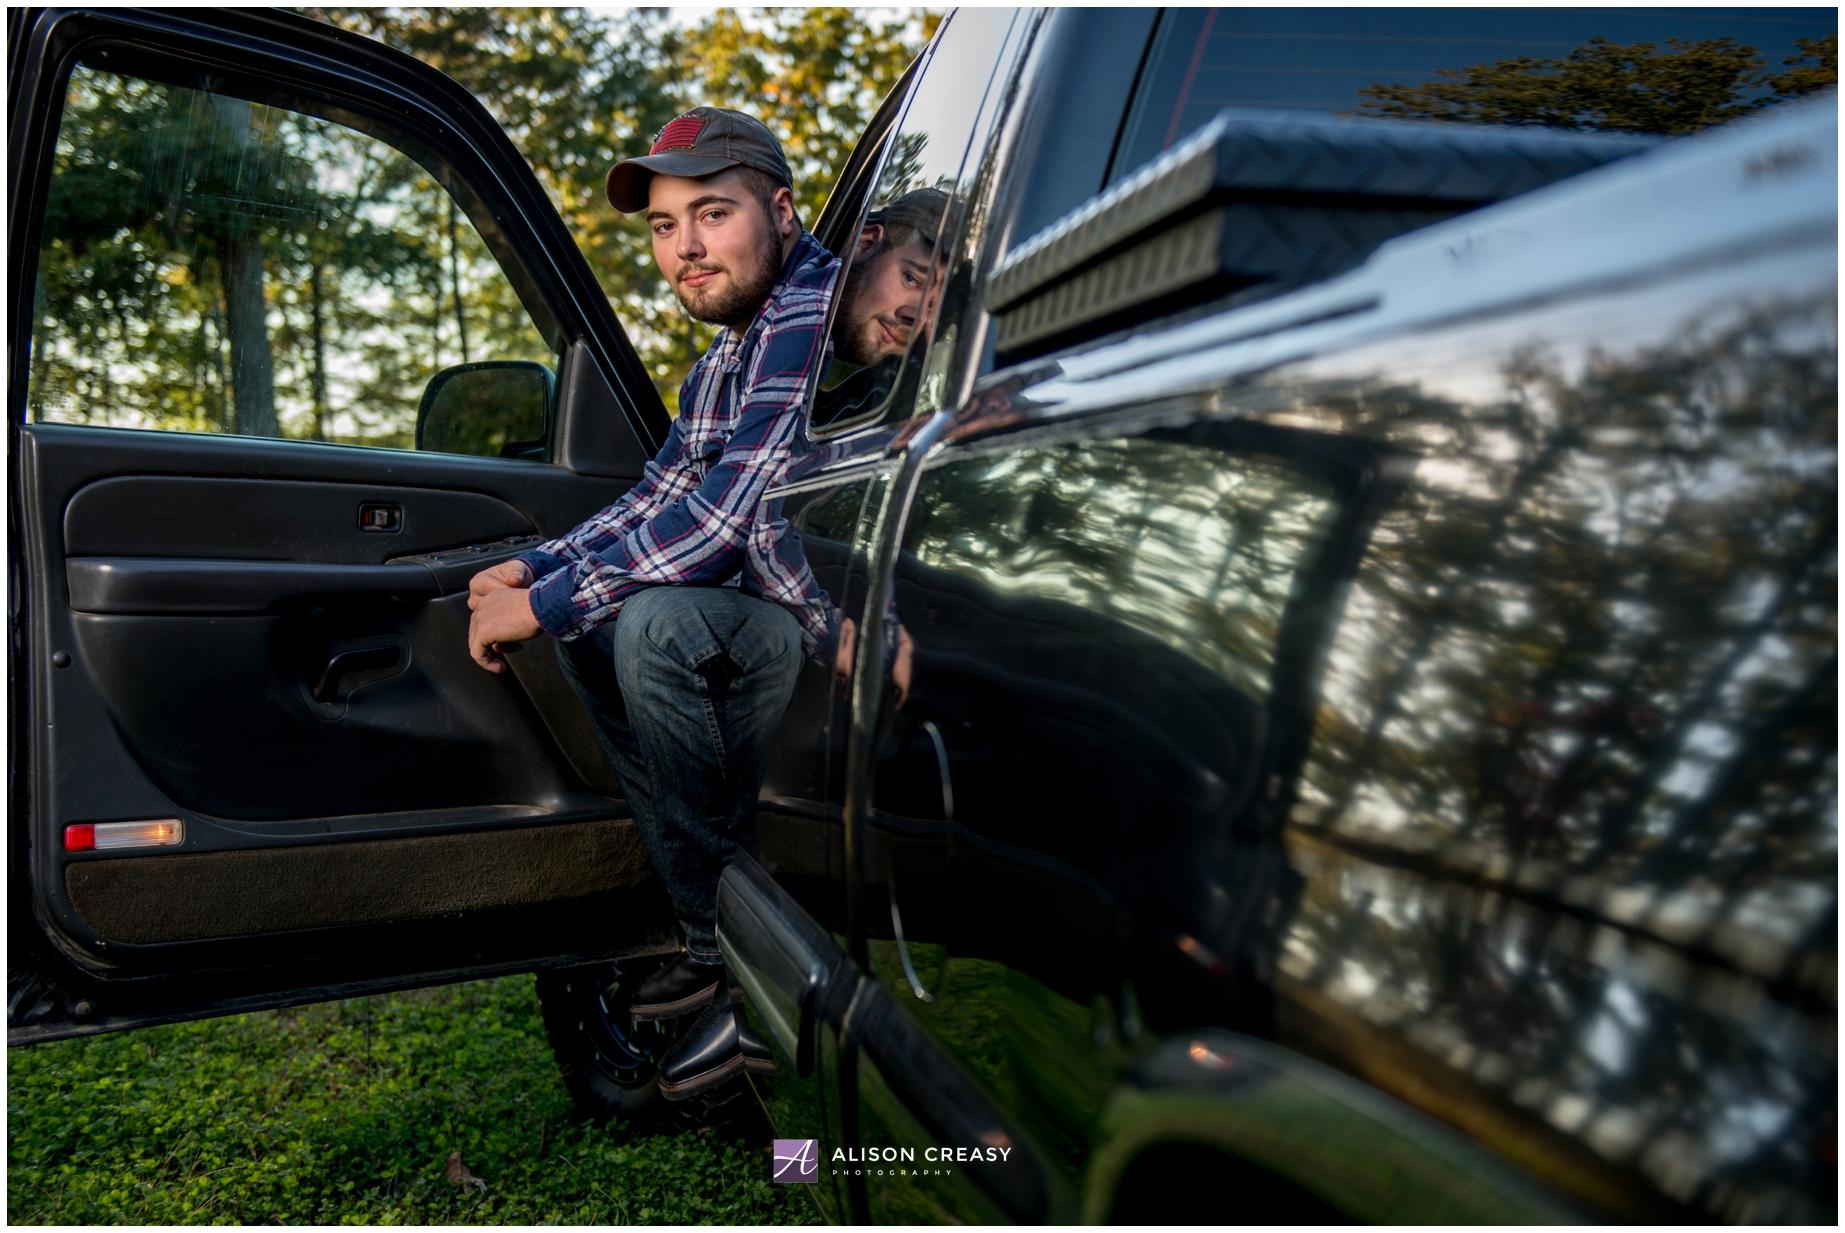 Alison-Creasy-Photography-Lynchburg-VA-Photographer_1003.jpg